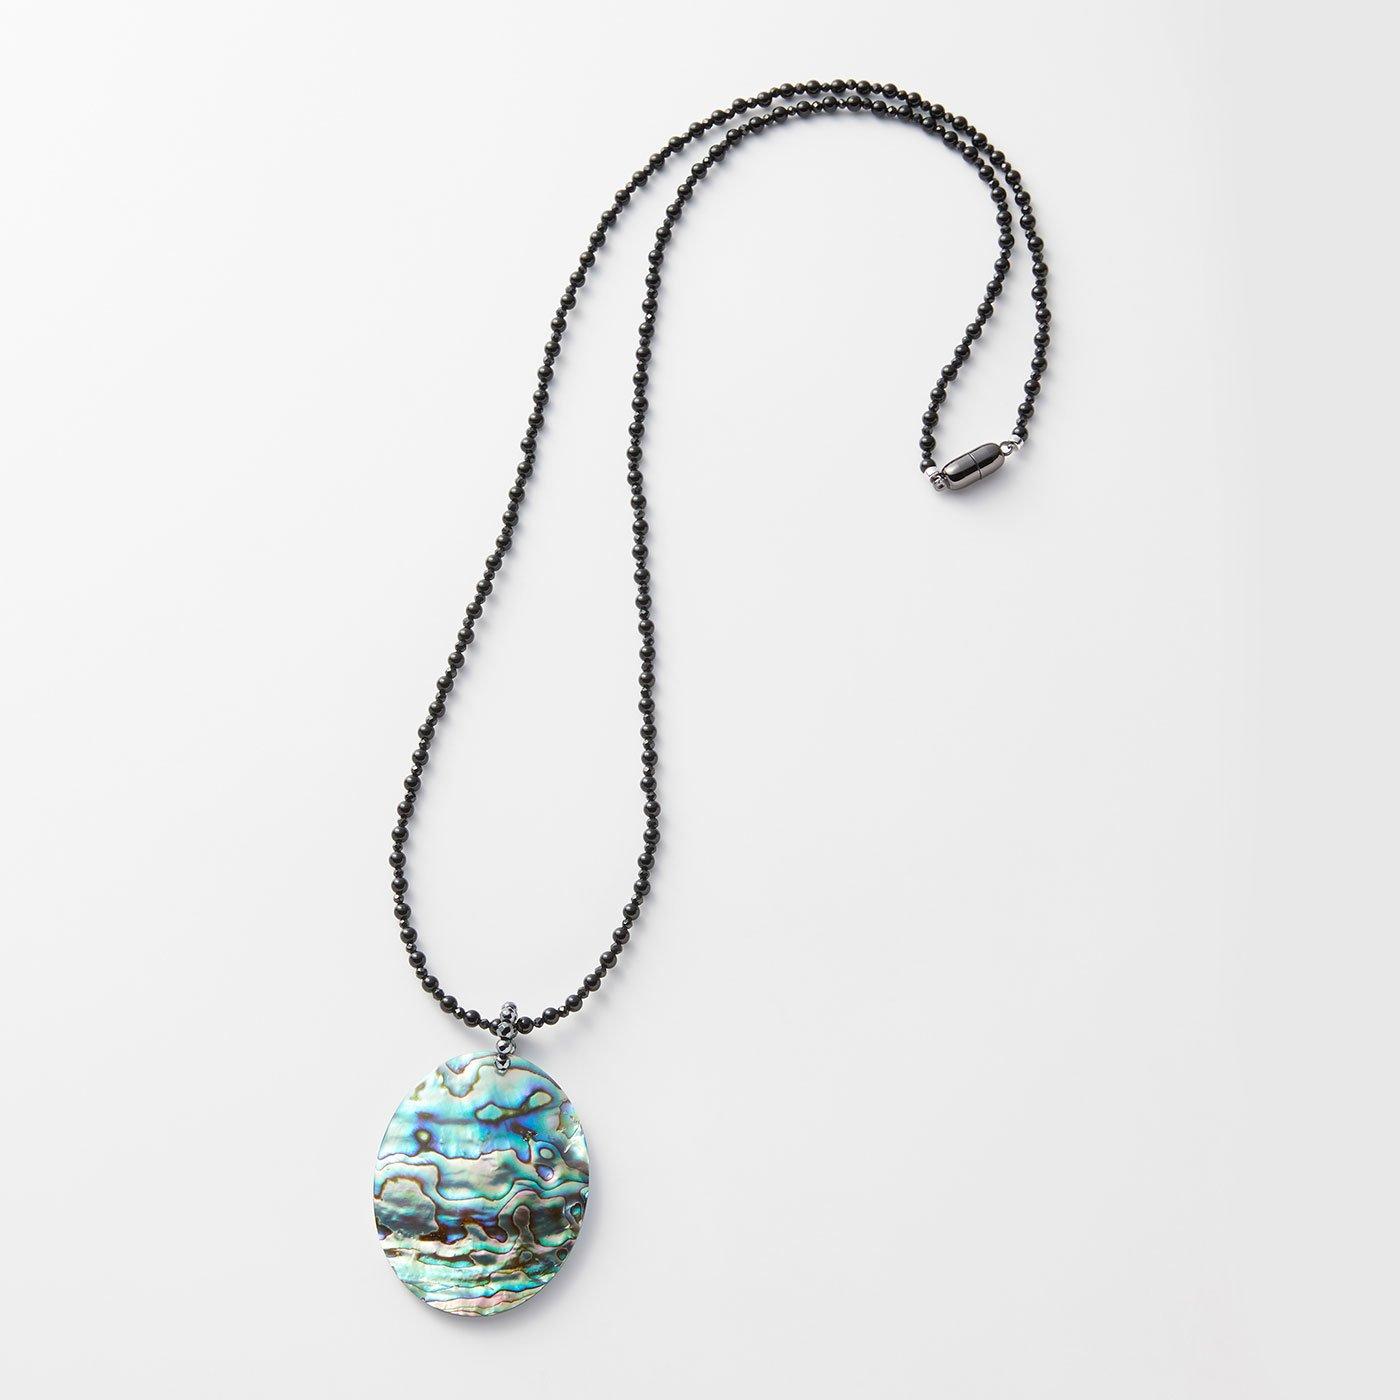 LXセレクト 海の宝石アバロンシェル&オニキスネックレス